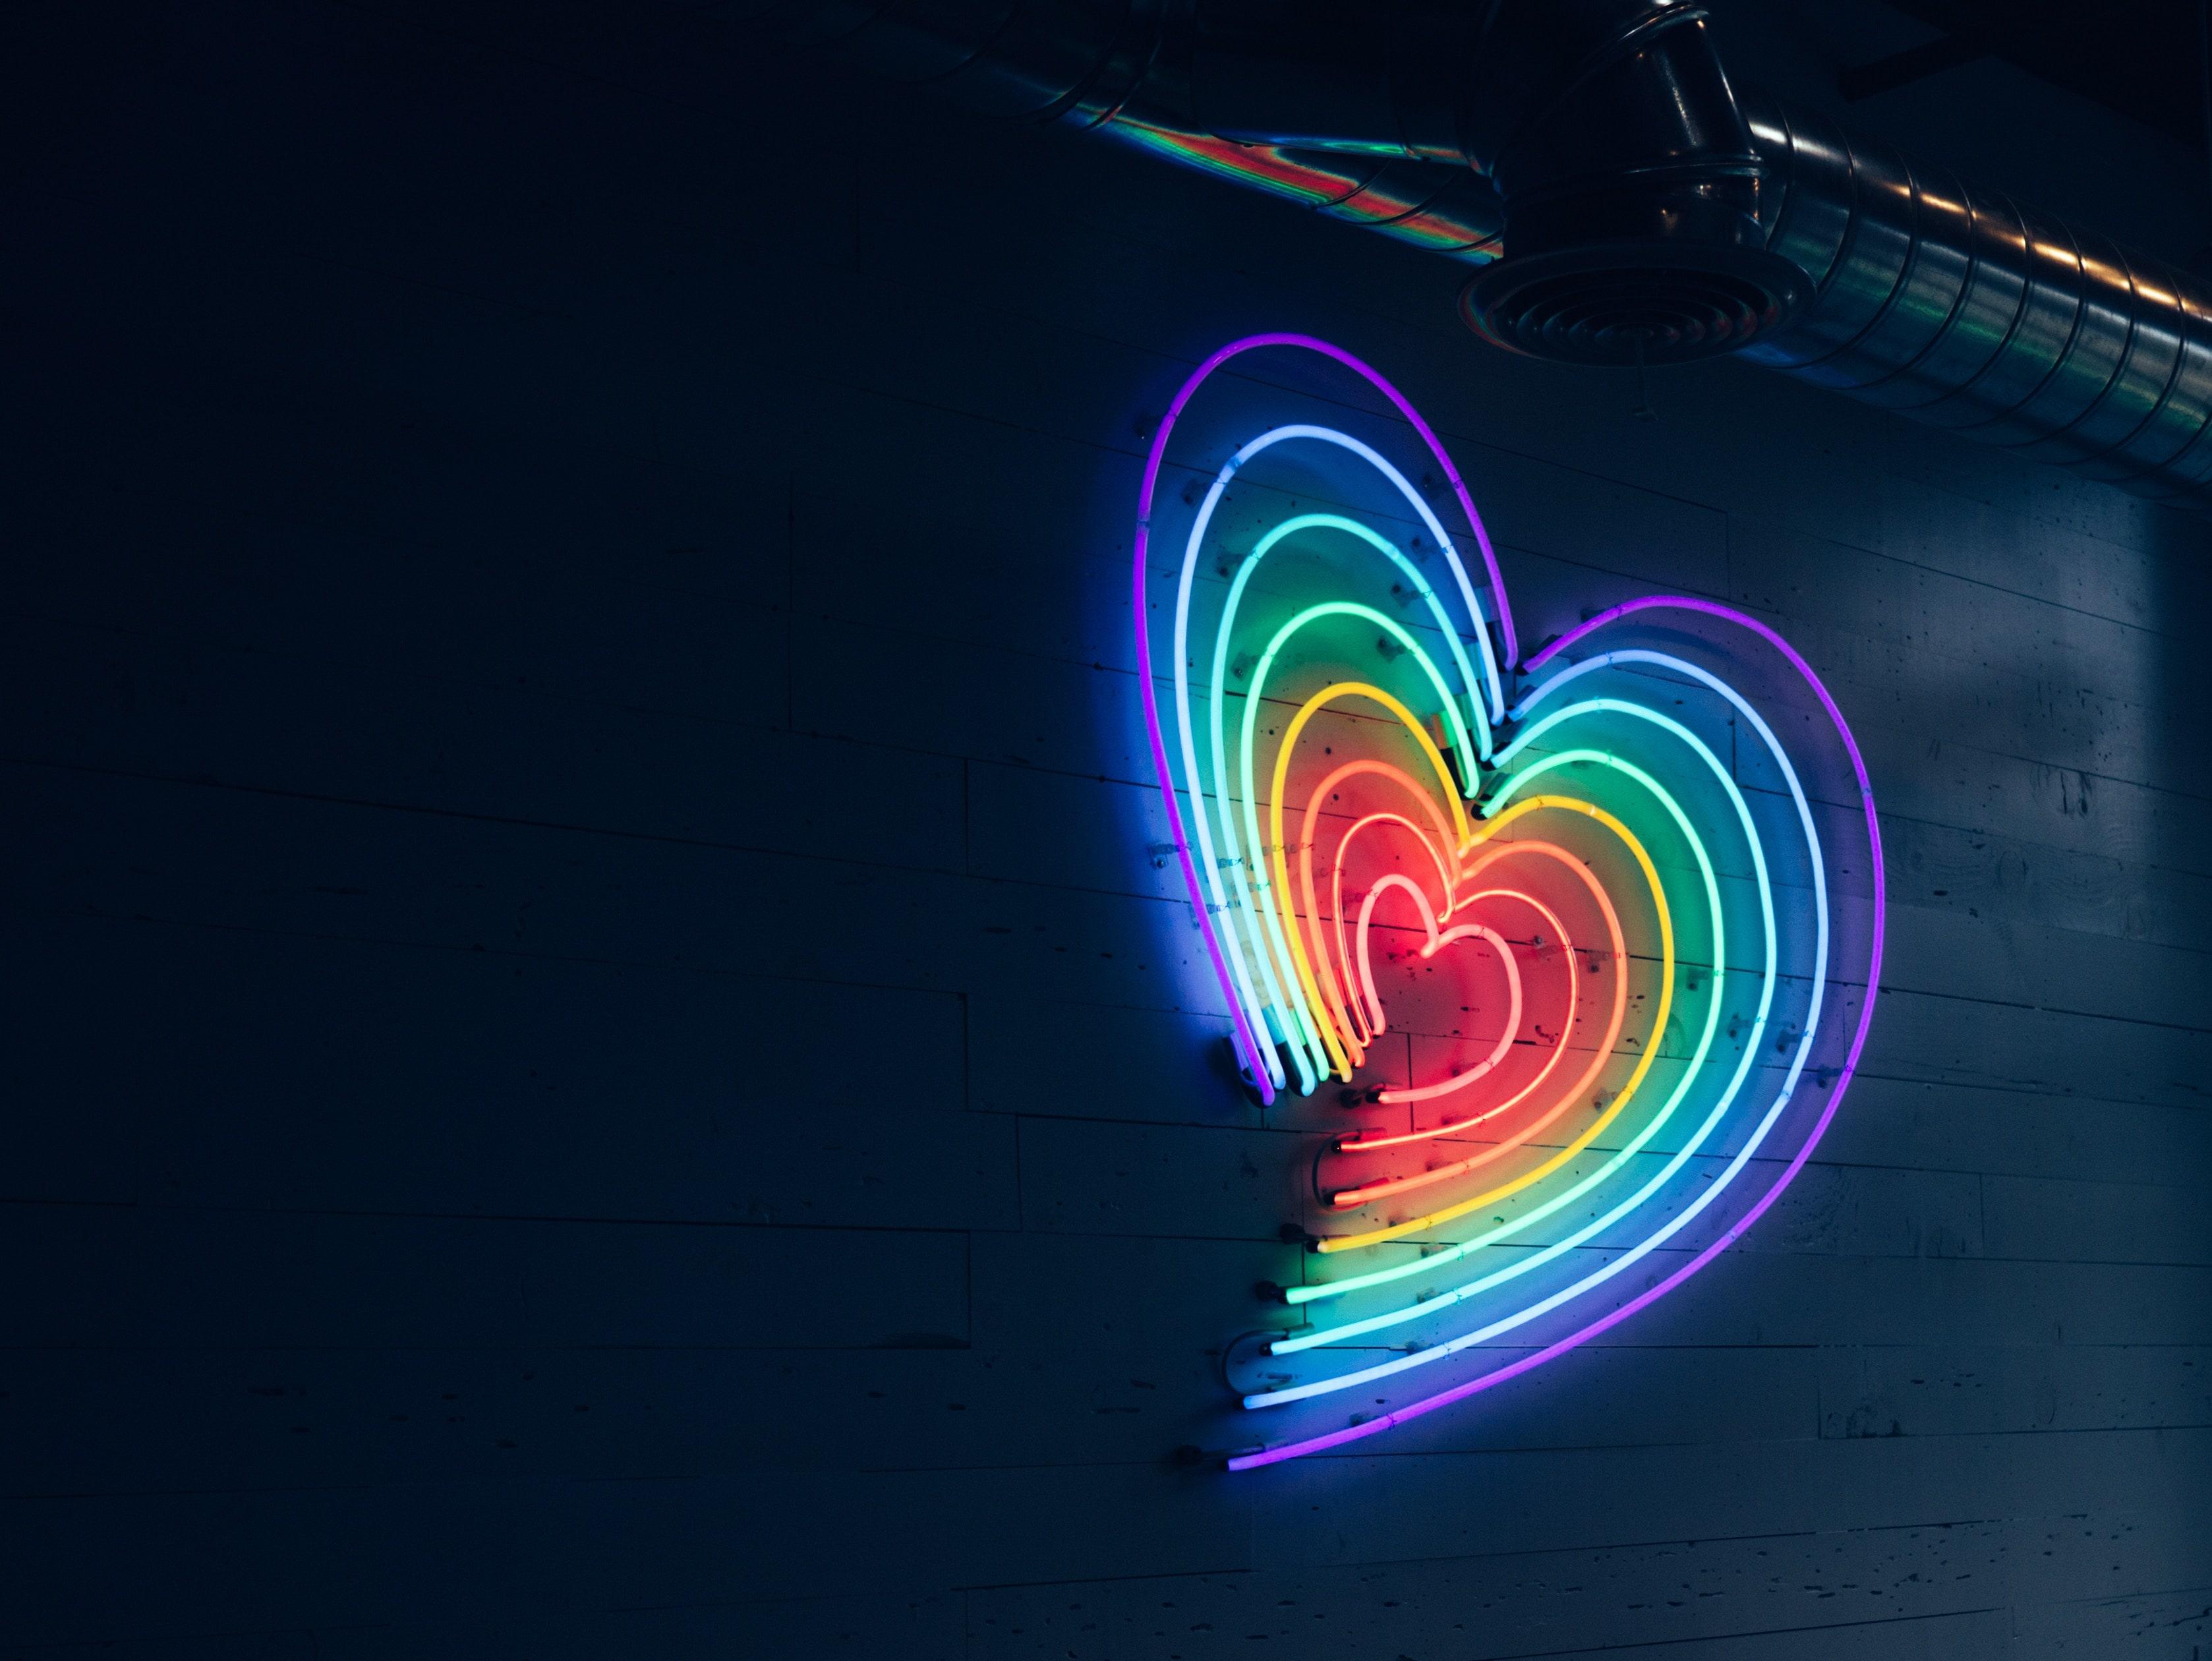 rainbow heart for alternative valentine's day